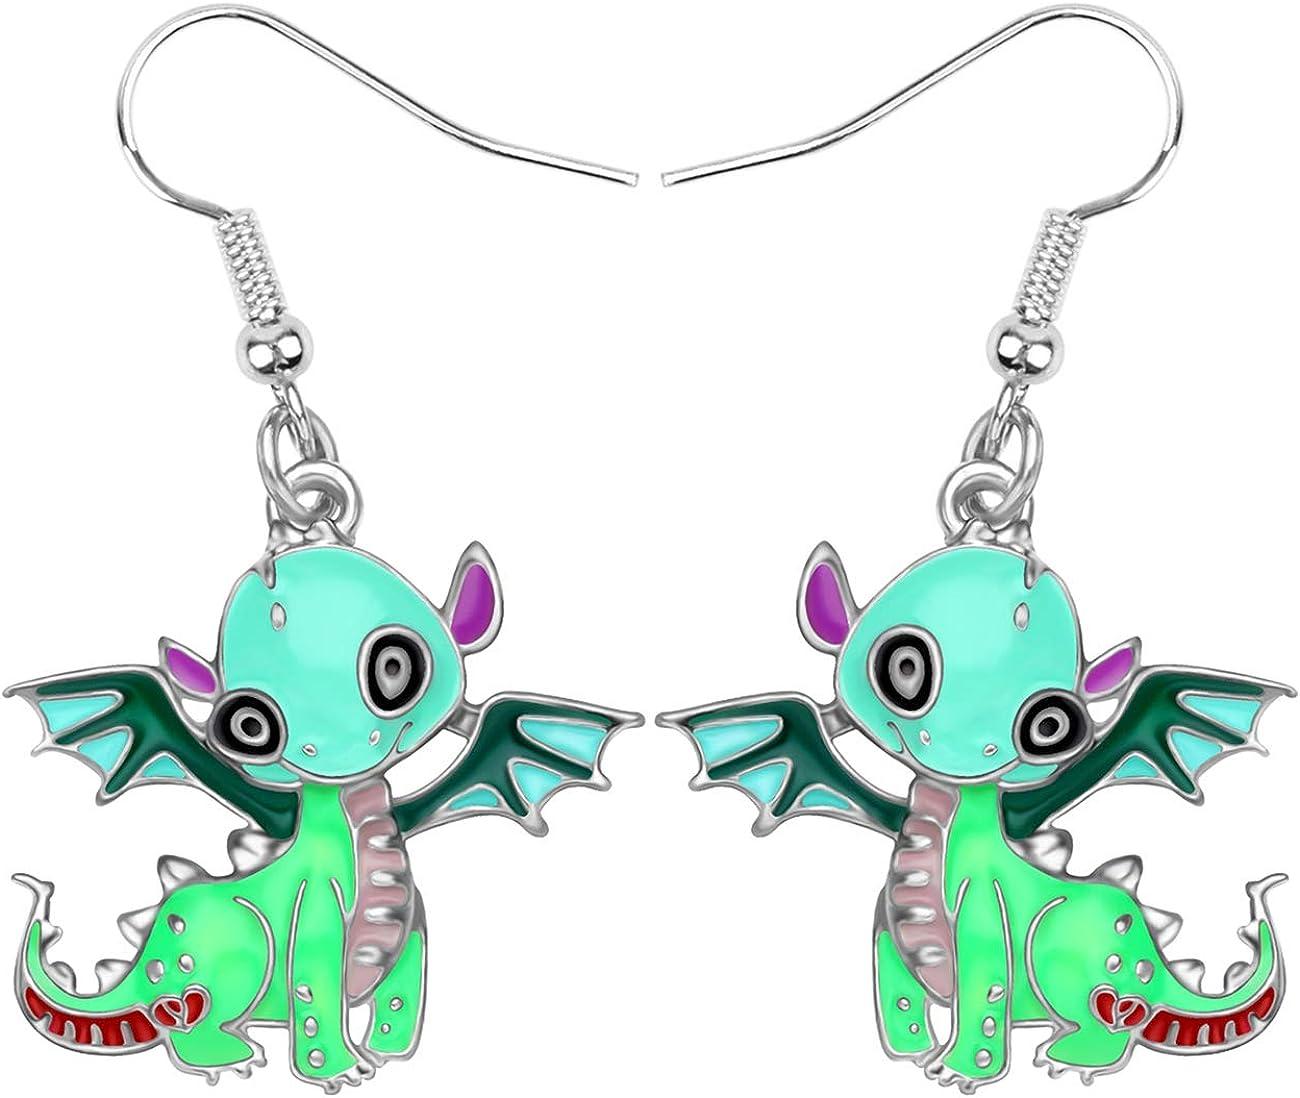 DUOWEI Cute Dinosaur Dragon Earrings Dainty Enamel Dangle Drop Funny Jewelry Gifts for Women Teen Girls Charms